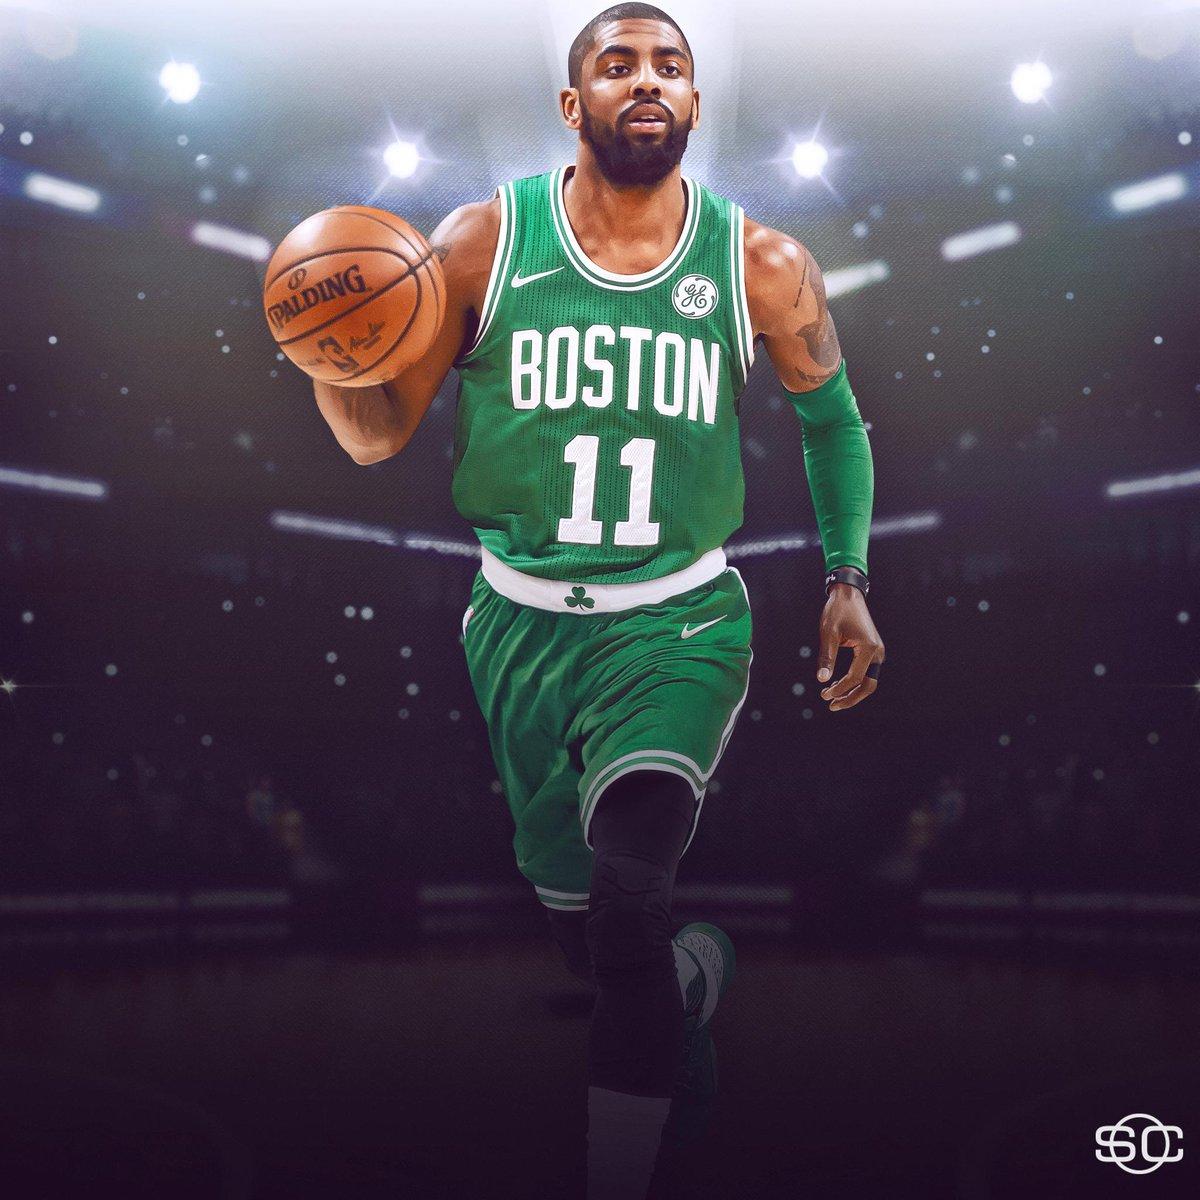 The Celtics open the 2017-18 season in Cleveland. 👀